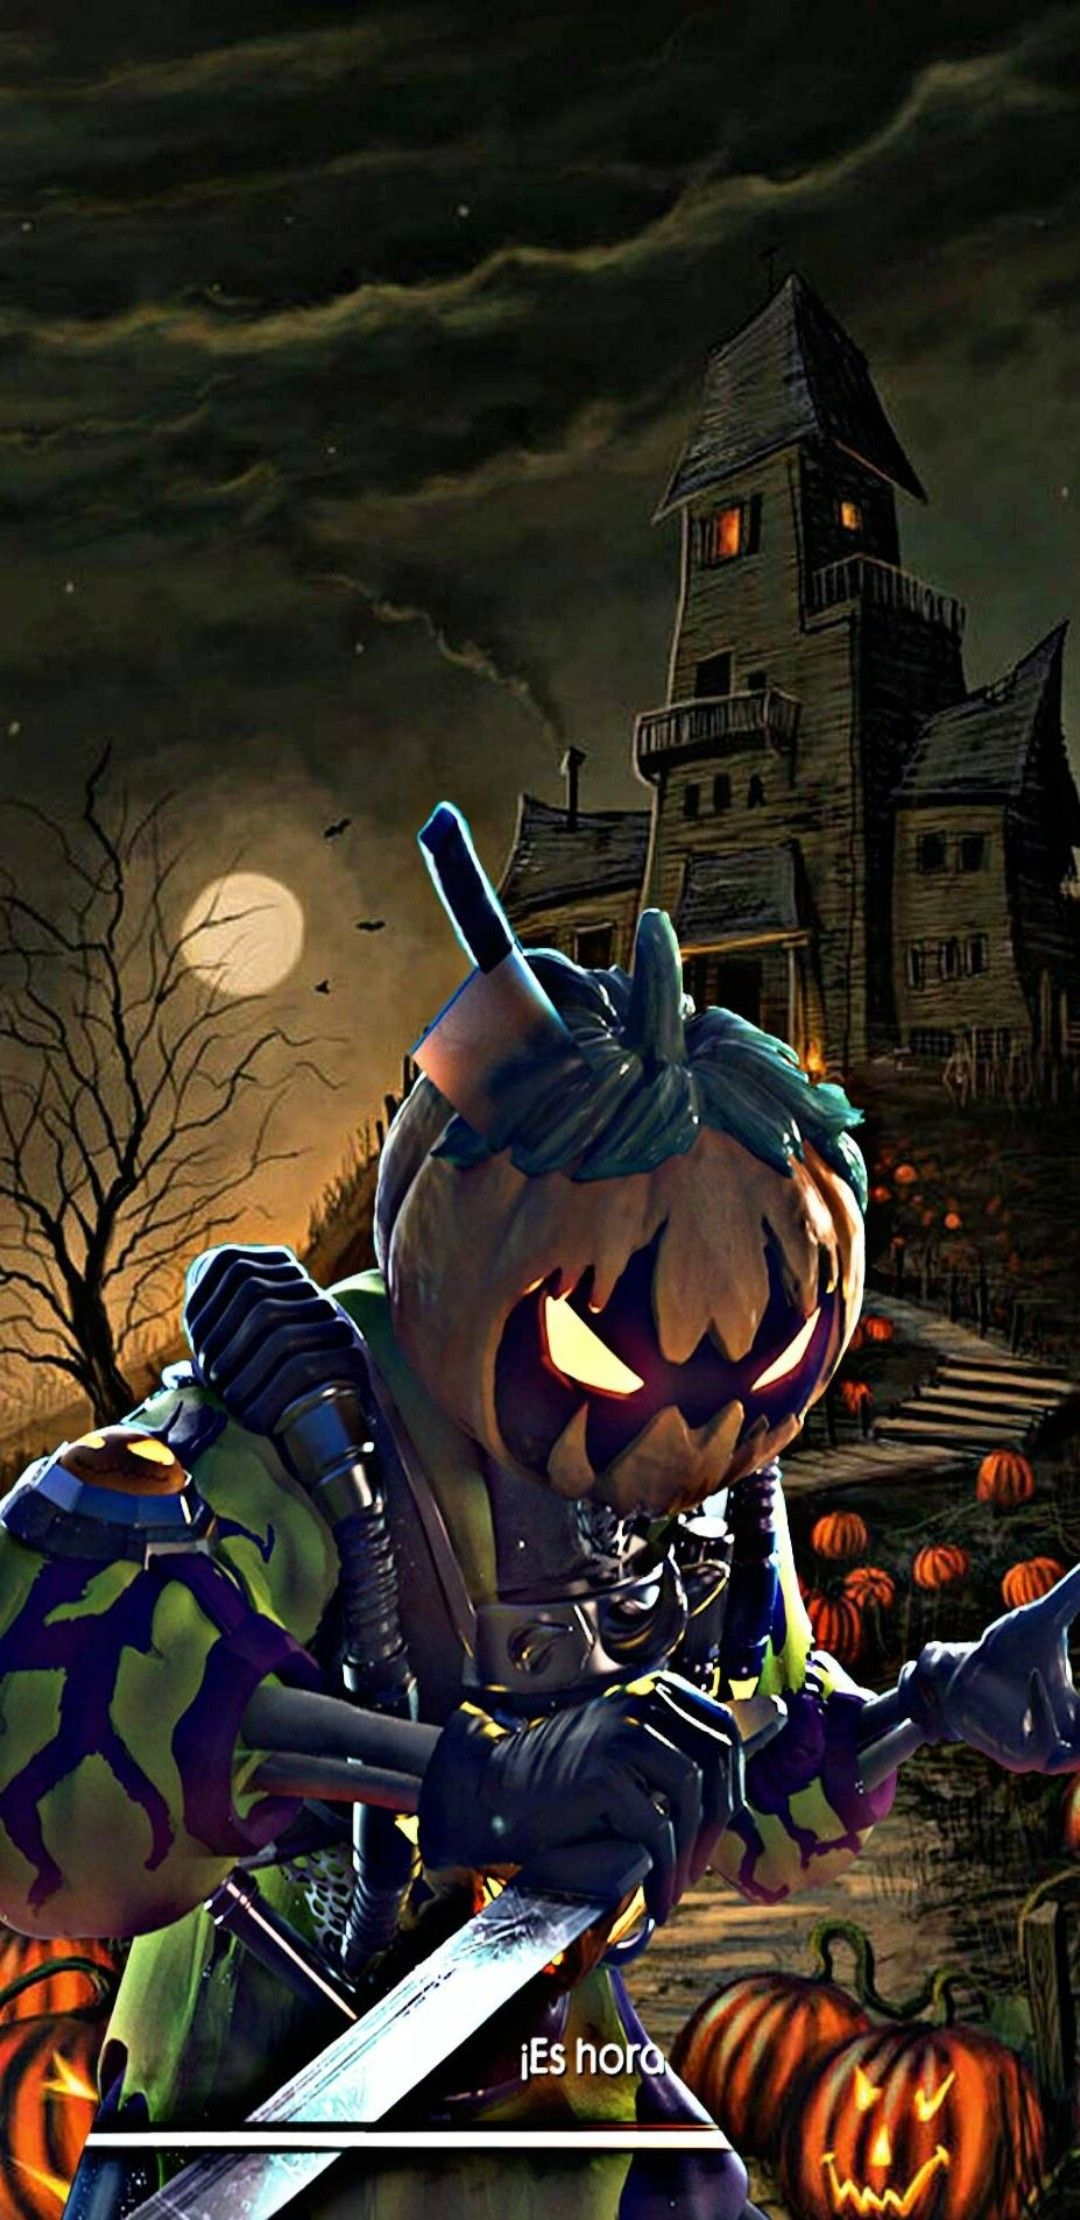 Pin De Pennie Lobin En Halloween Descargas De Fondos De Pantalla Fondo De Pantalla De Inconformista Fondos De Halloween